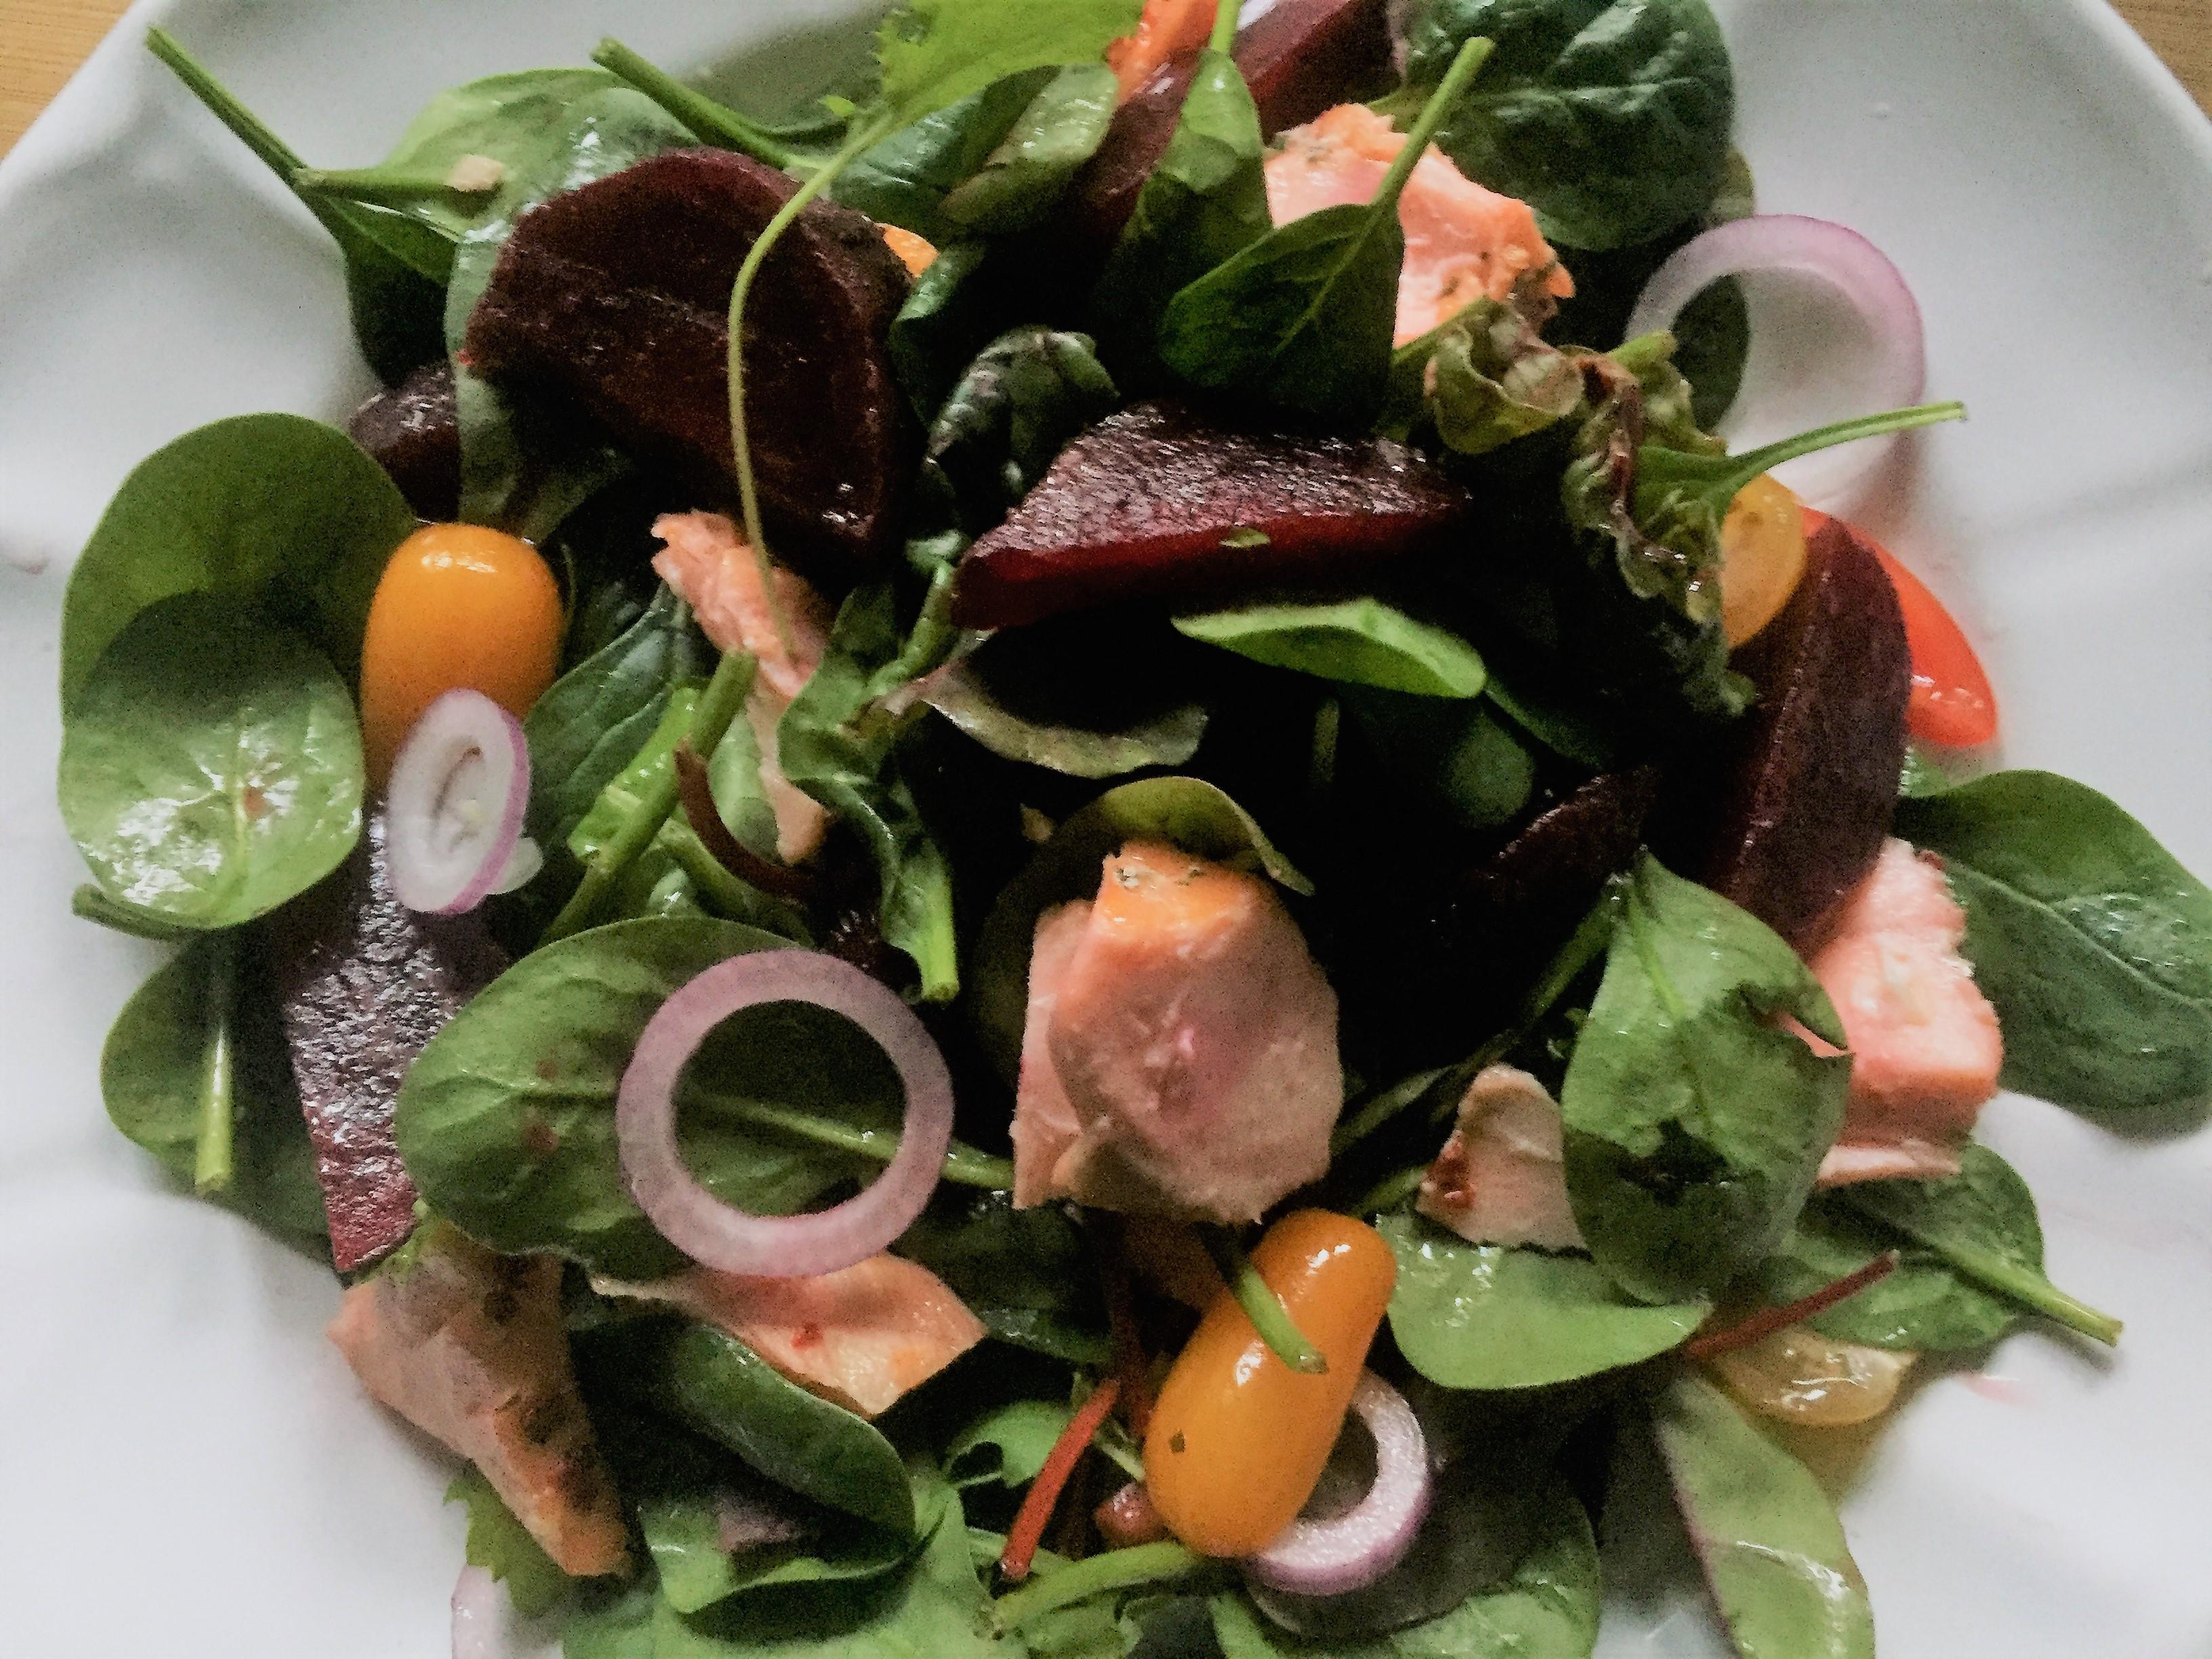 Salmon, chard, beetroot & heritage tomatoes salad.